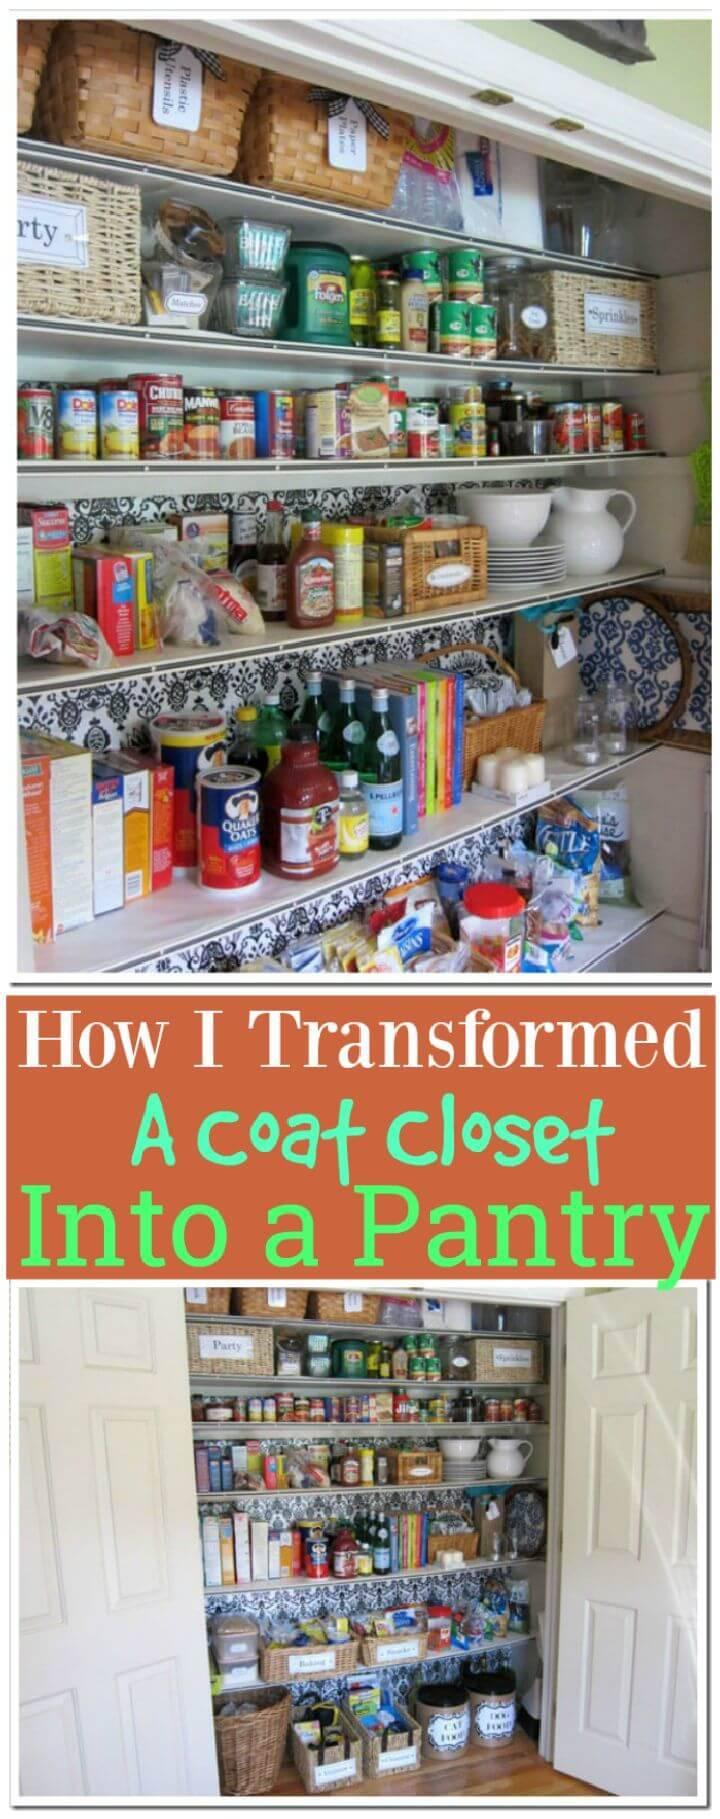 How I Transformed a Coat Closet Into a Pantry